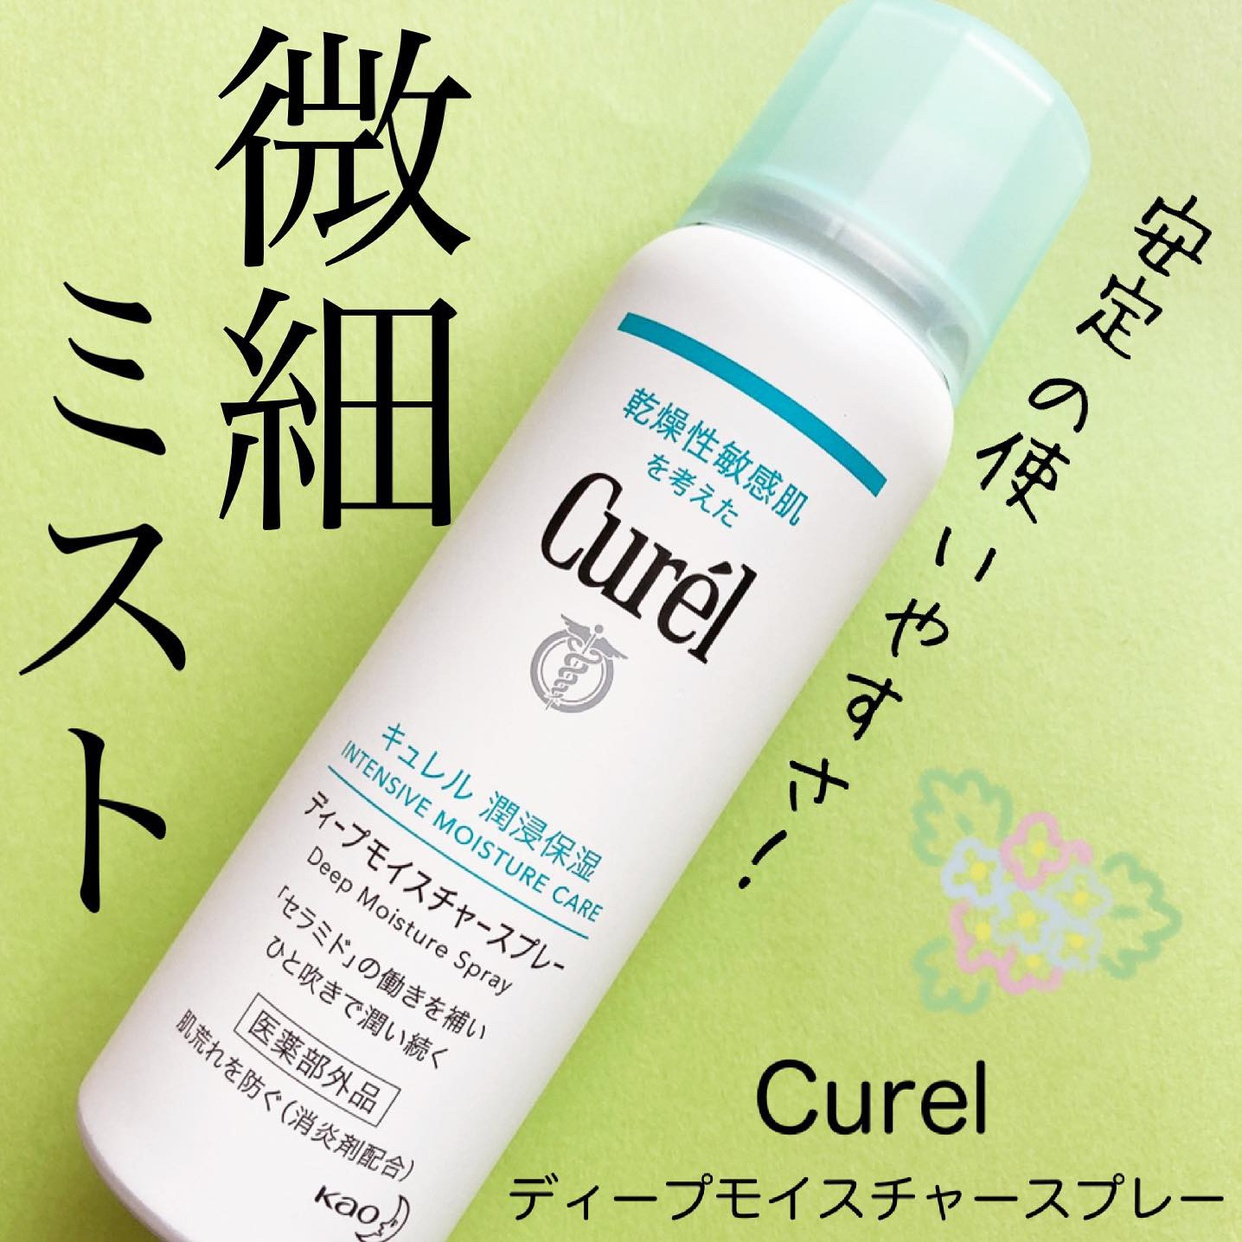 Curél(キュレル) ディープモイスチャースプレーの良い点・メリットに関するyunaさんの口コミ画像1